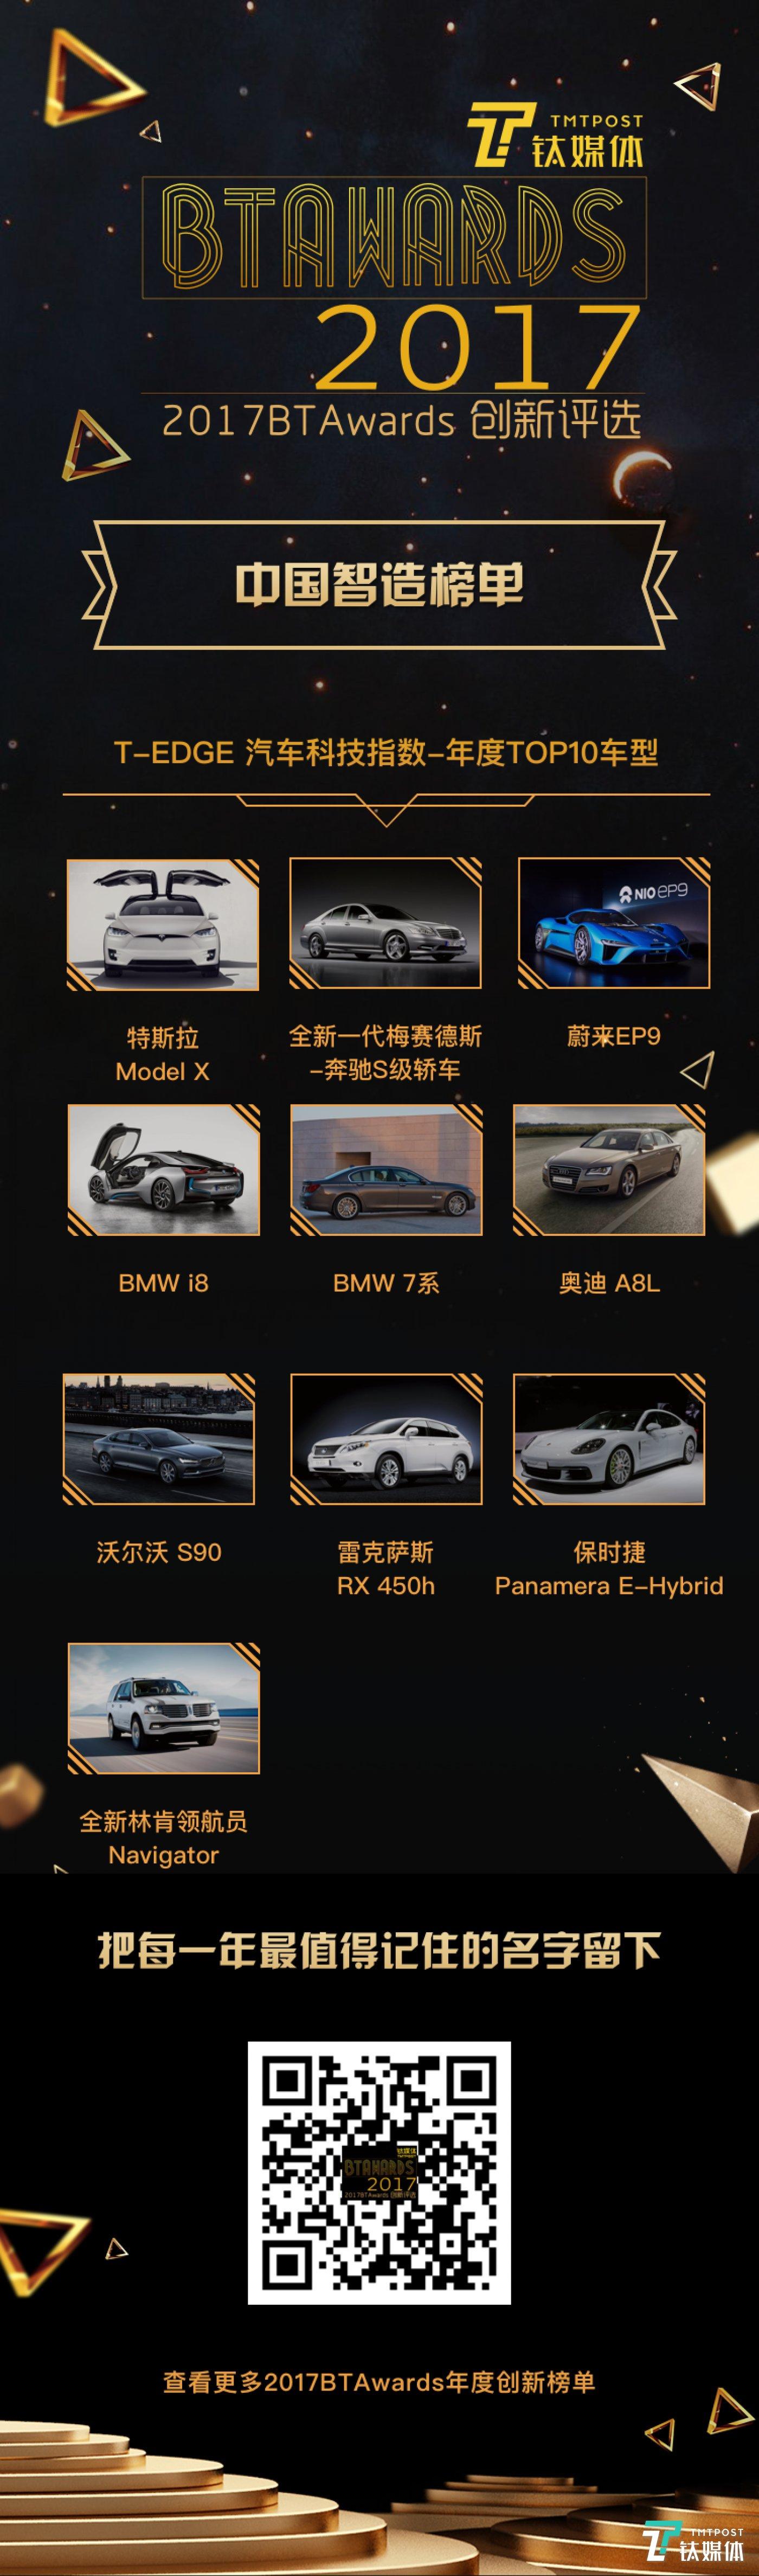 2017 T-EDGE 汽车科技指数-年度TOP 10车型